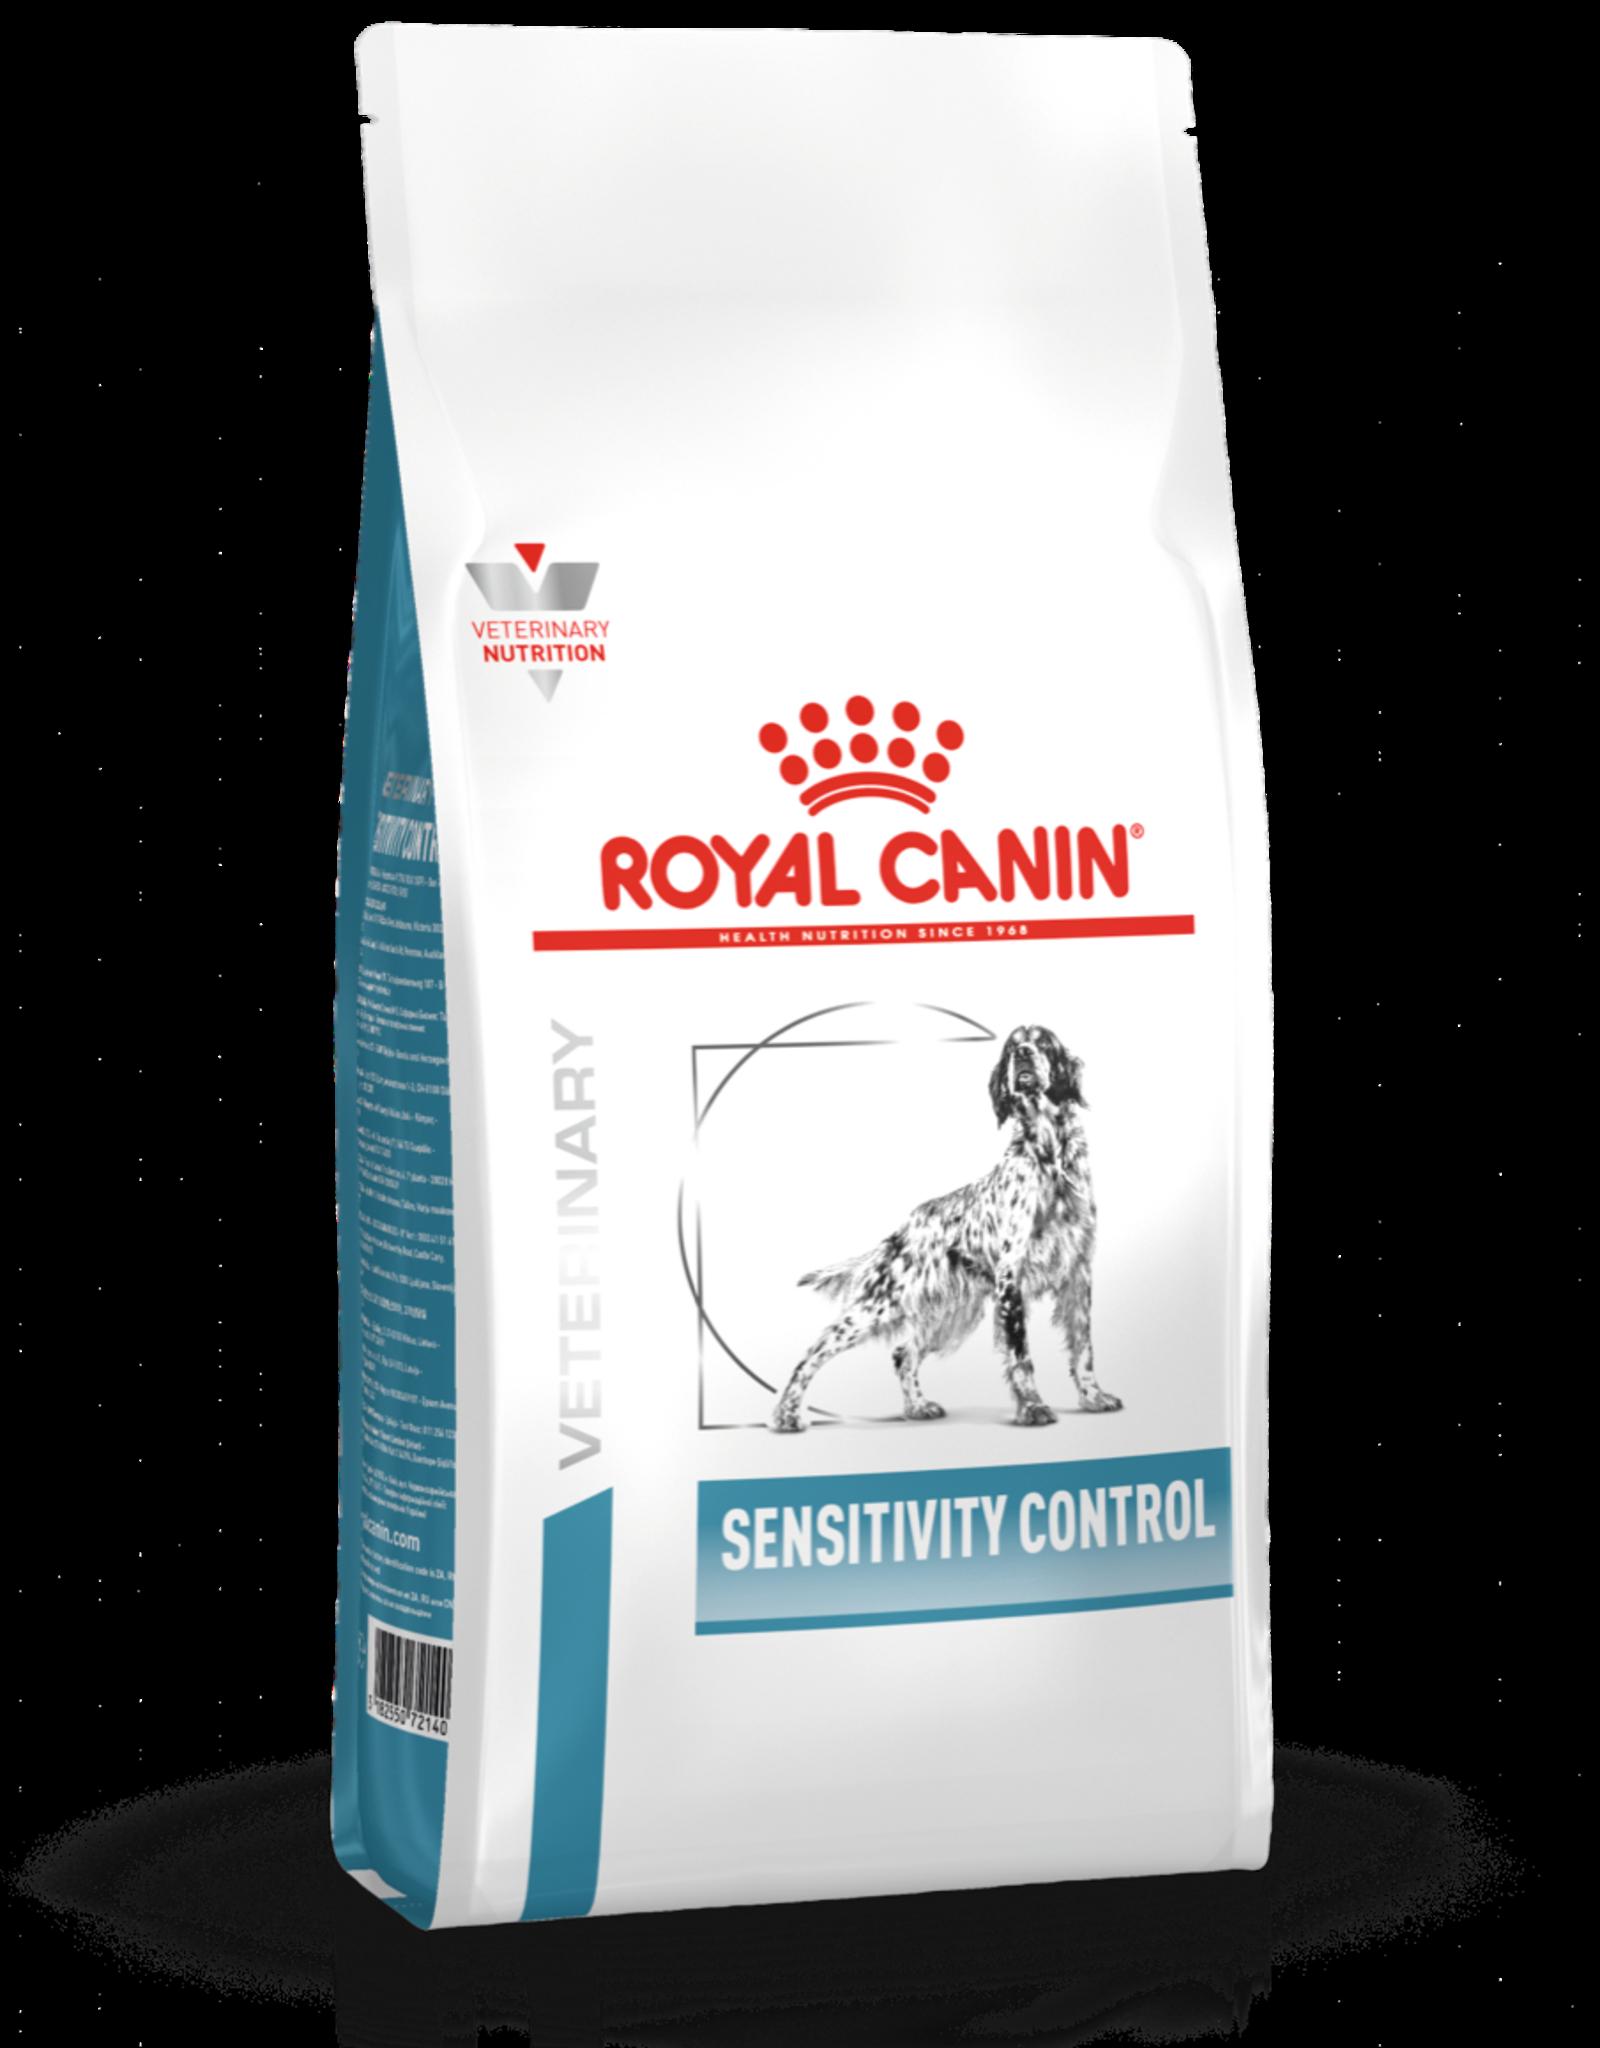 Royal Canin Royal Canin Sensitivity Control Dog Duck 14kg